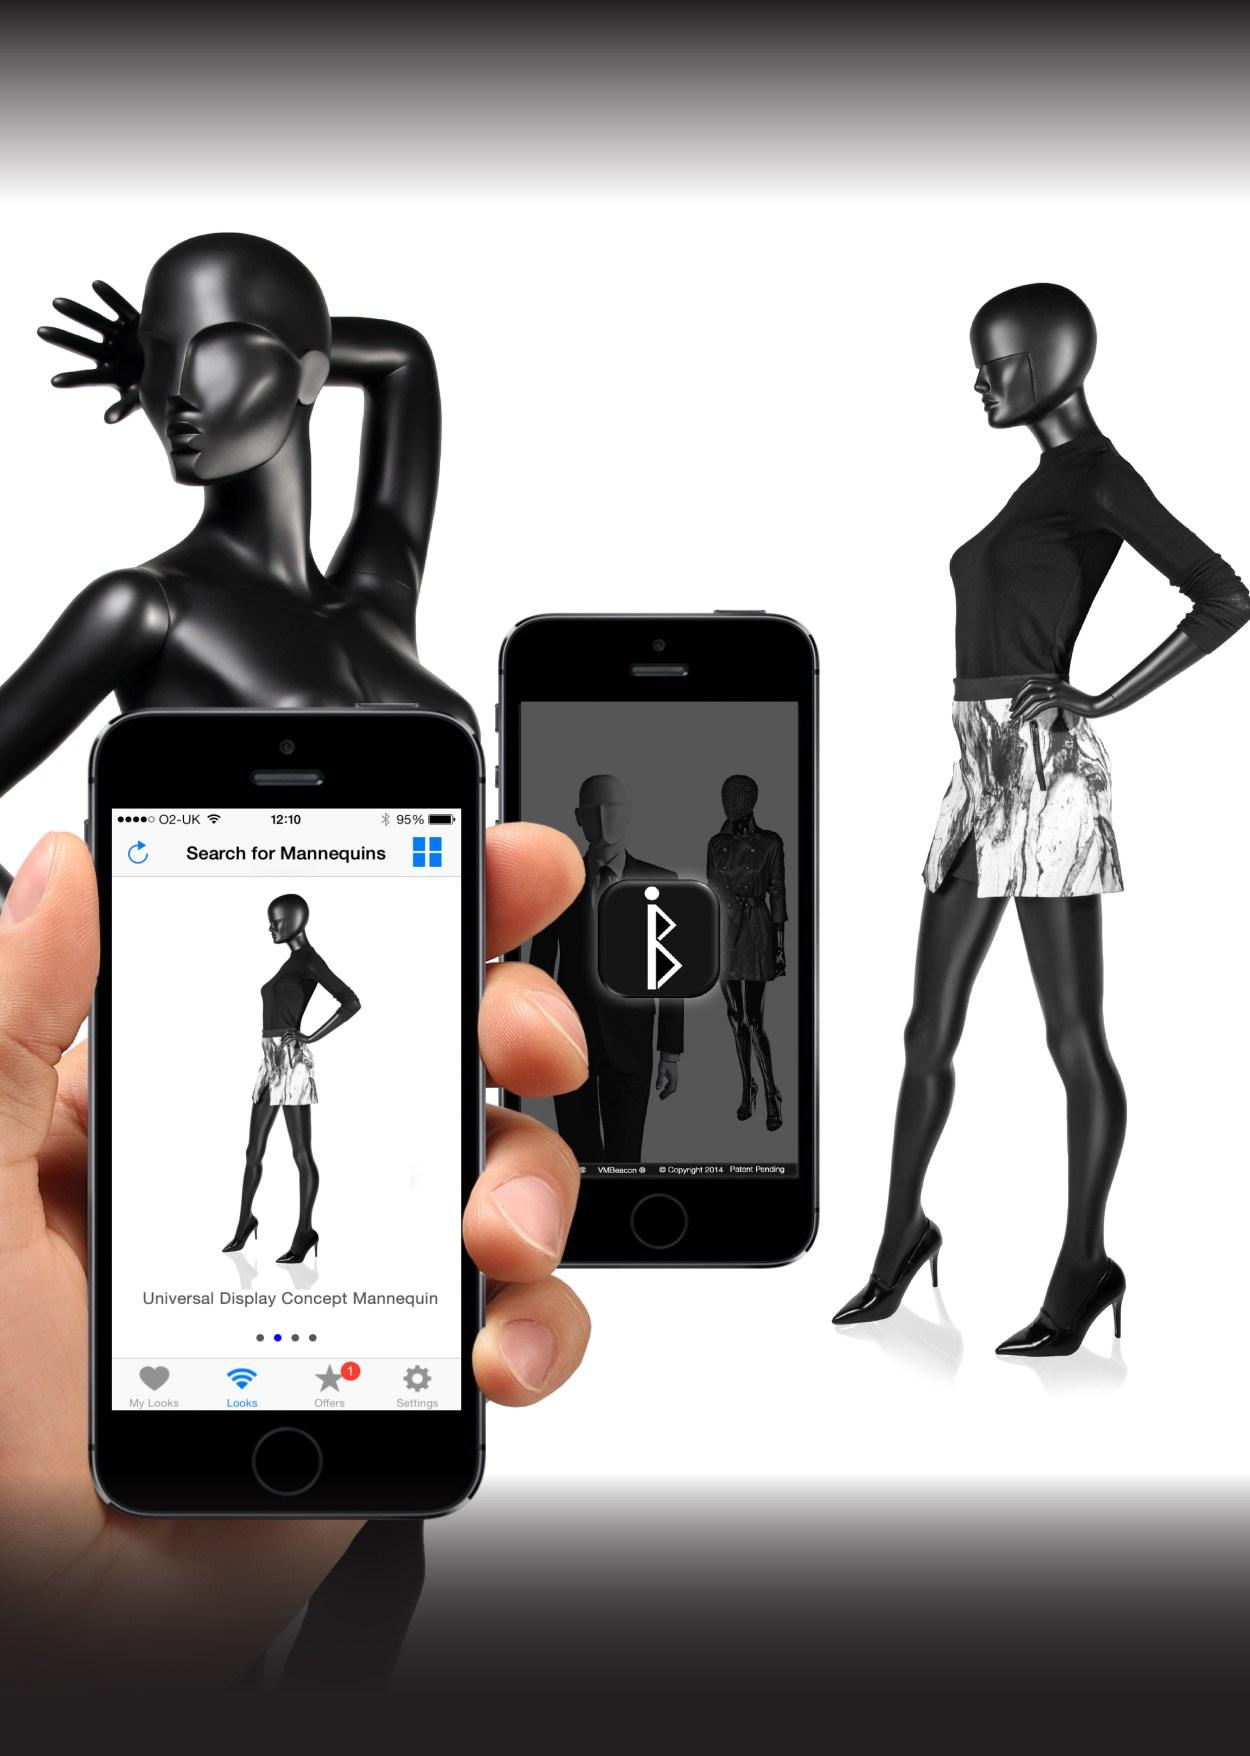 Universal Display Concept Mannequin & Iconeme VM Beacon